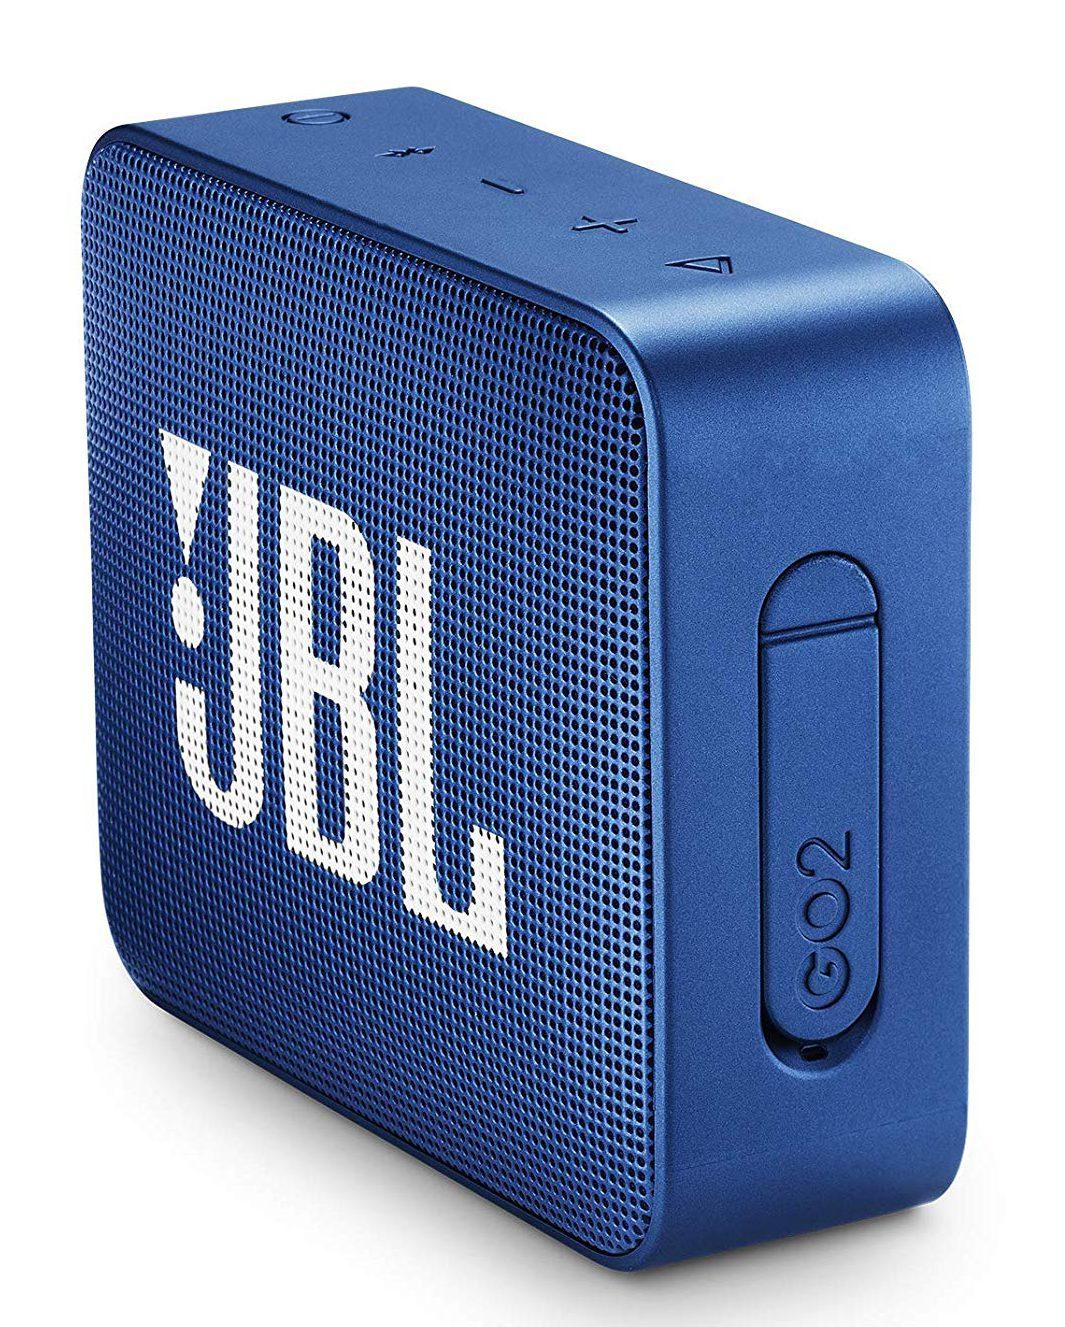 JBL amazon 5